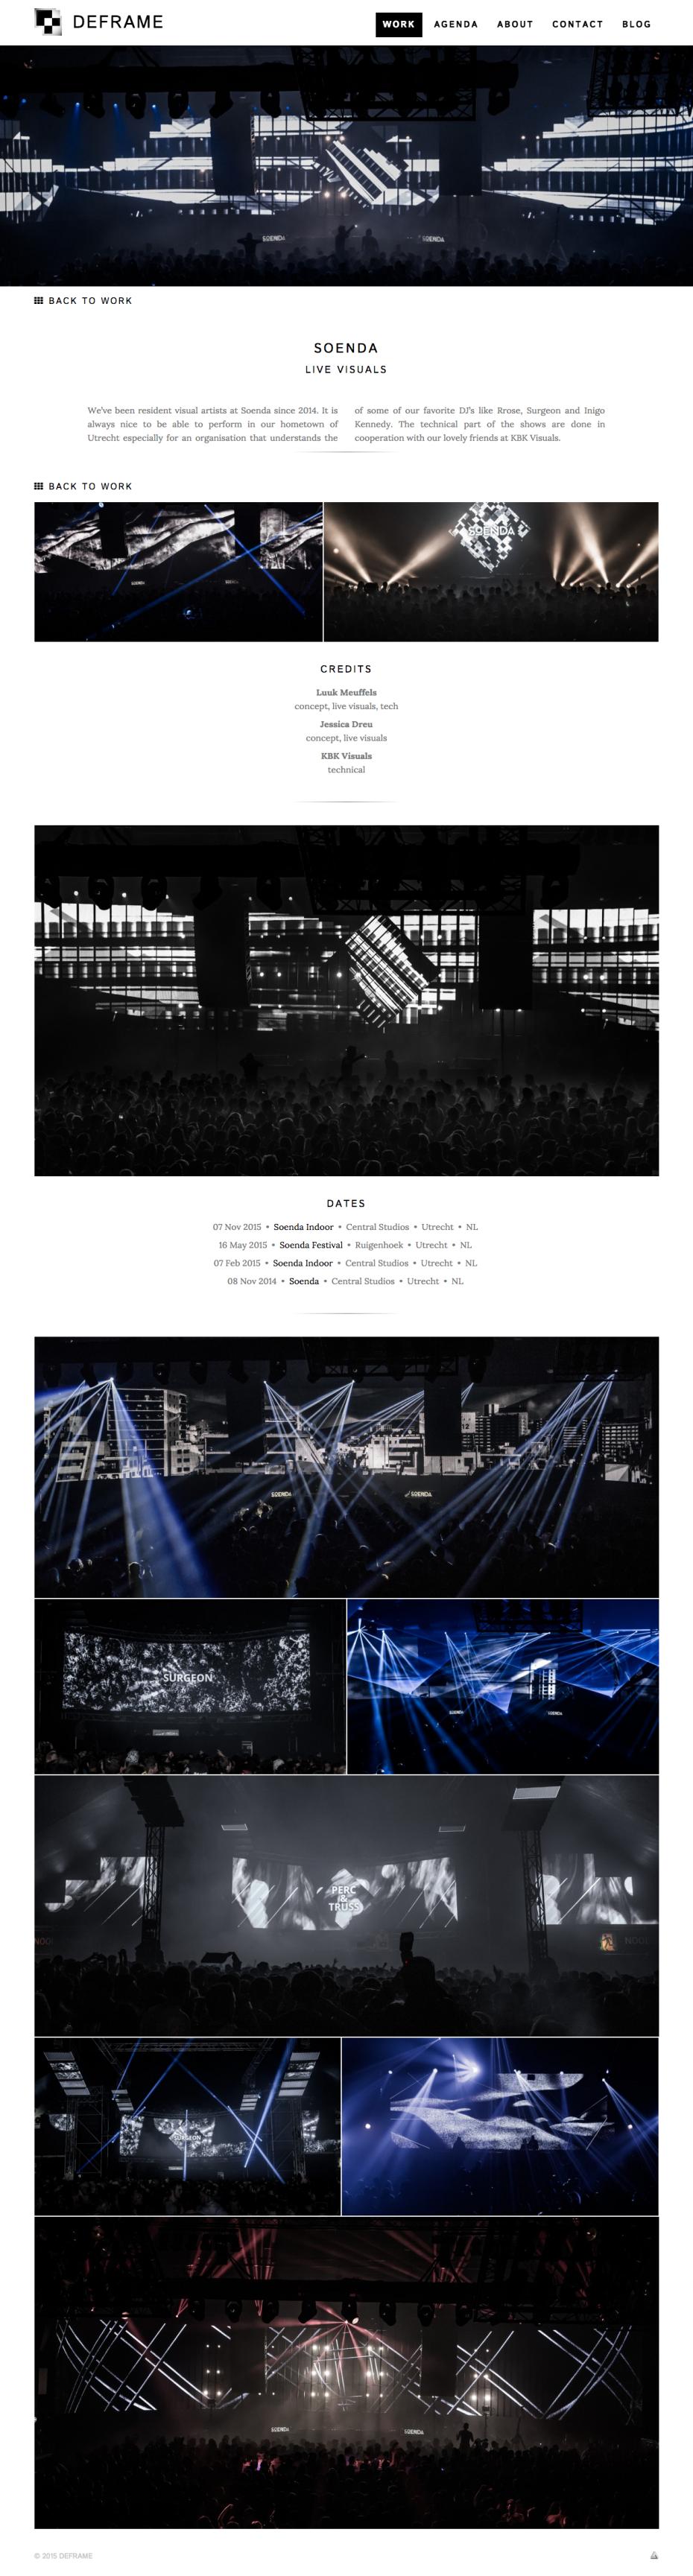 DEFRAME Project: Soenda